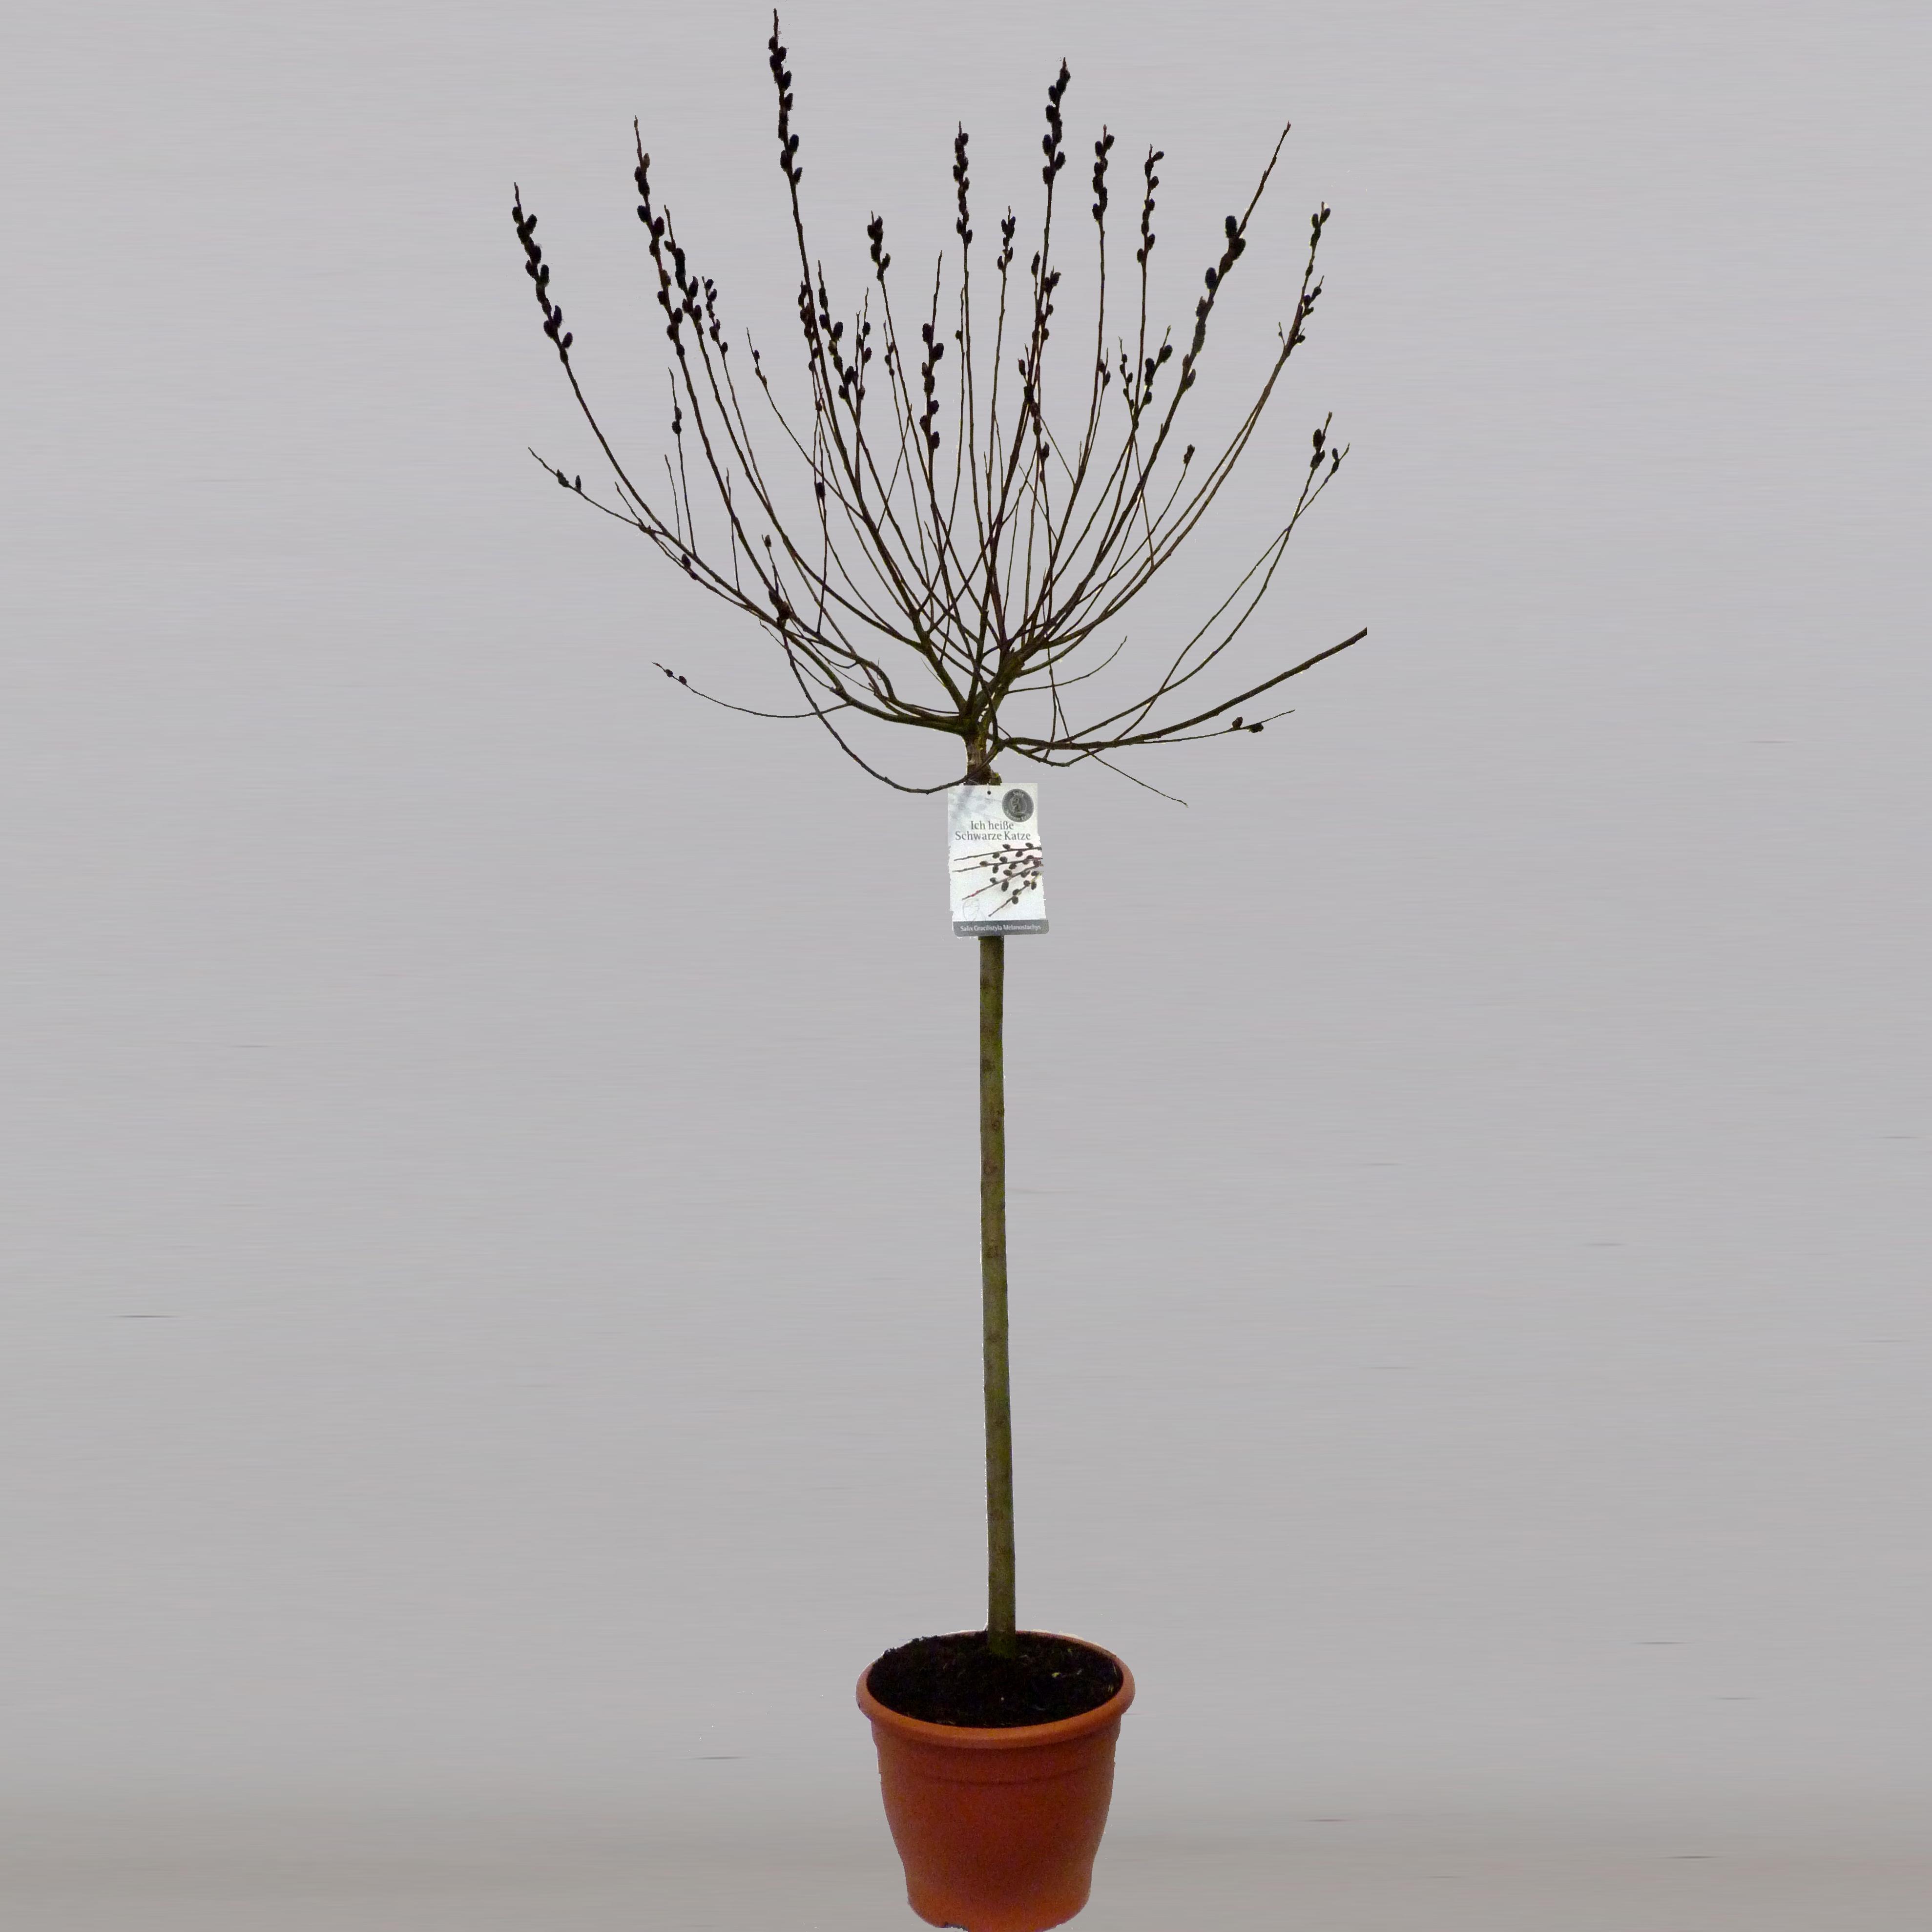 Salix Gracilistyla Melanostachys (stam 100)